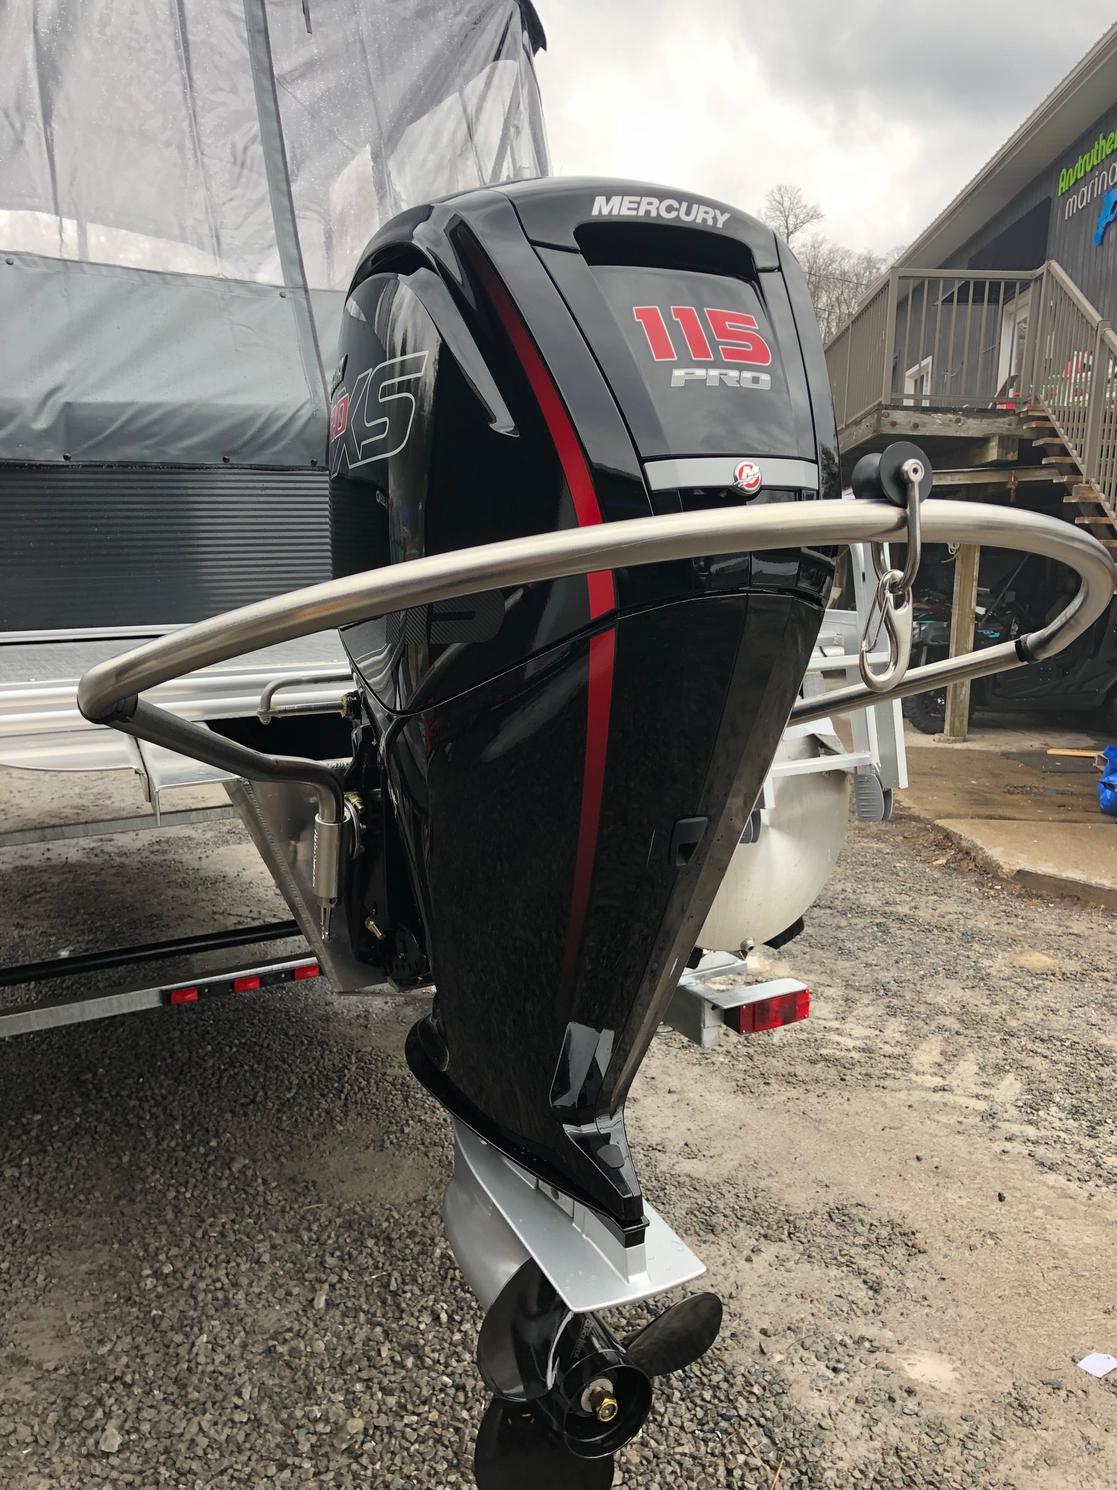 2021 TurboSwing xxl